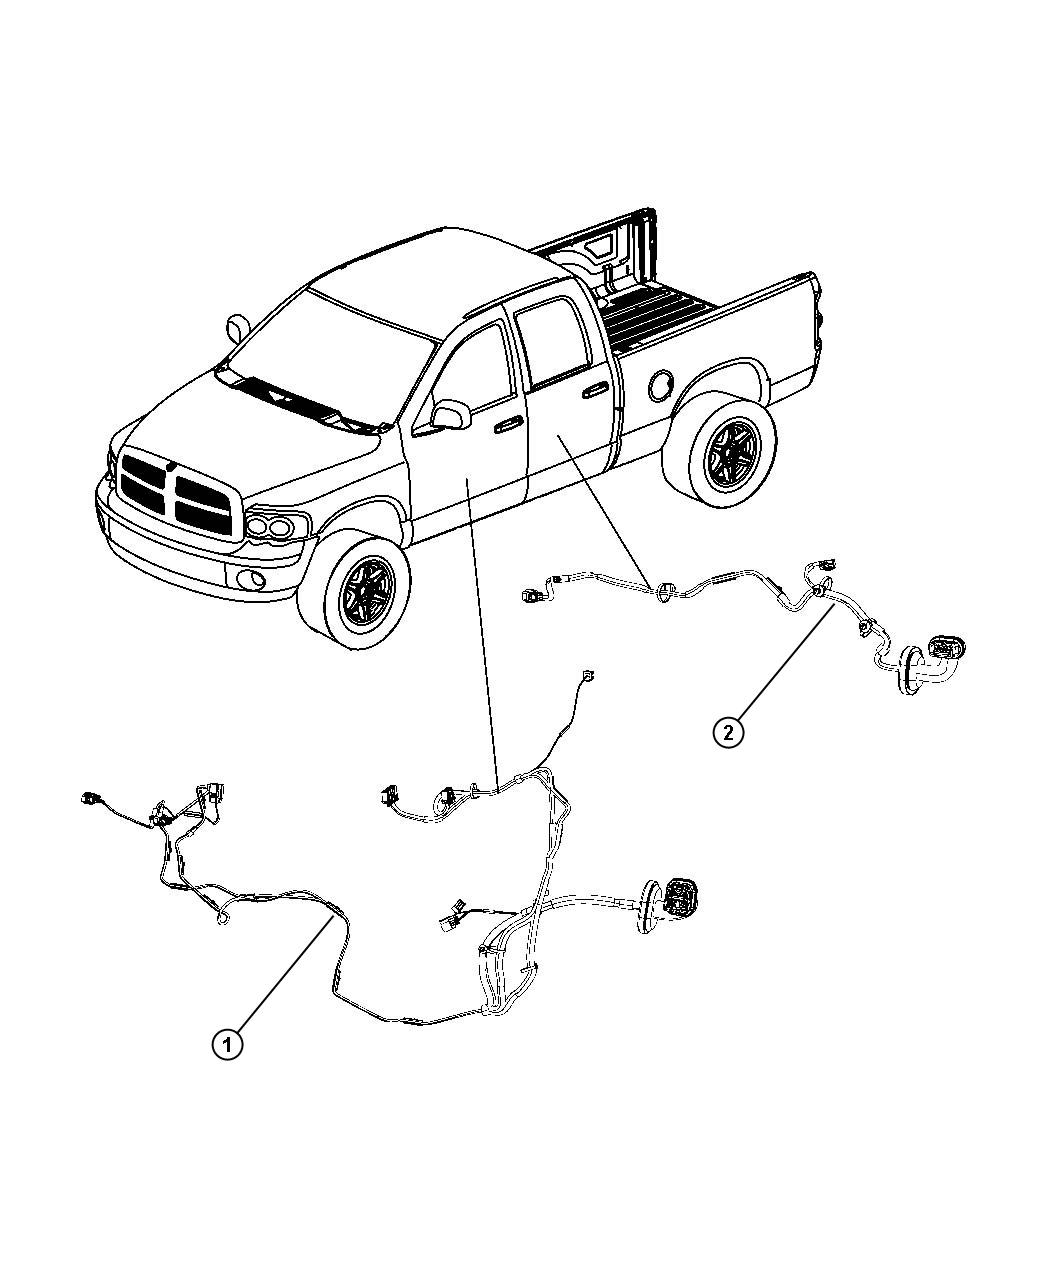 1998 dodge ram 2500 wiring diagram infinity